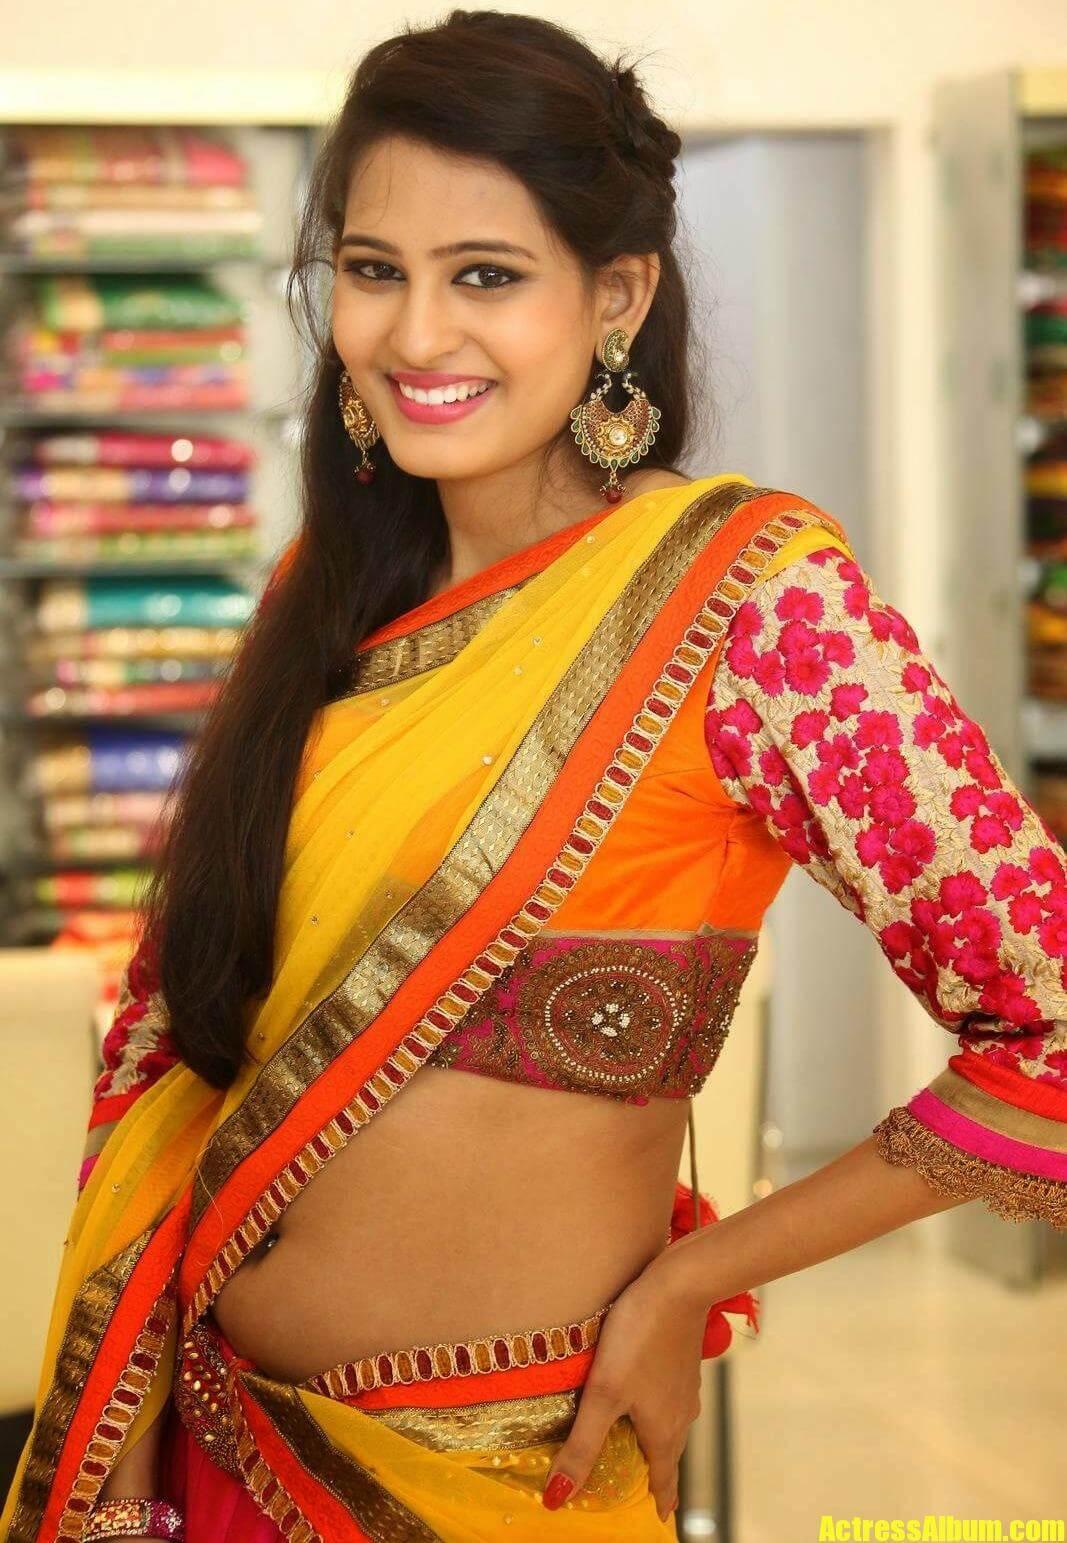 Shweta Jadhav Navel Show In Yellow Half Saree - Actress Album-6547